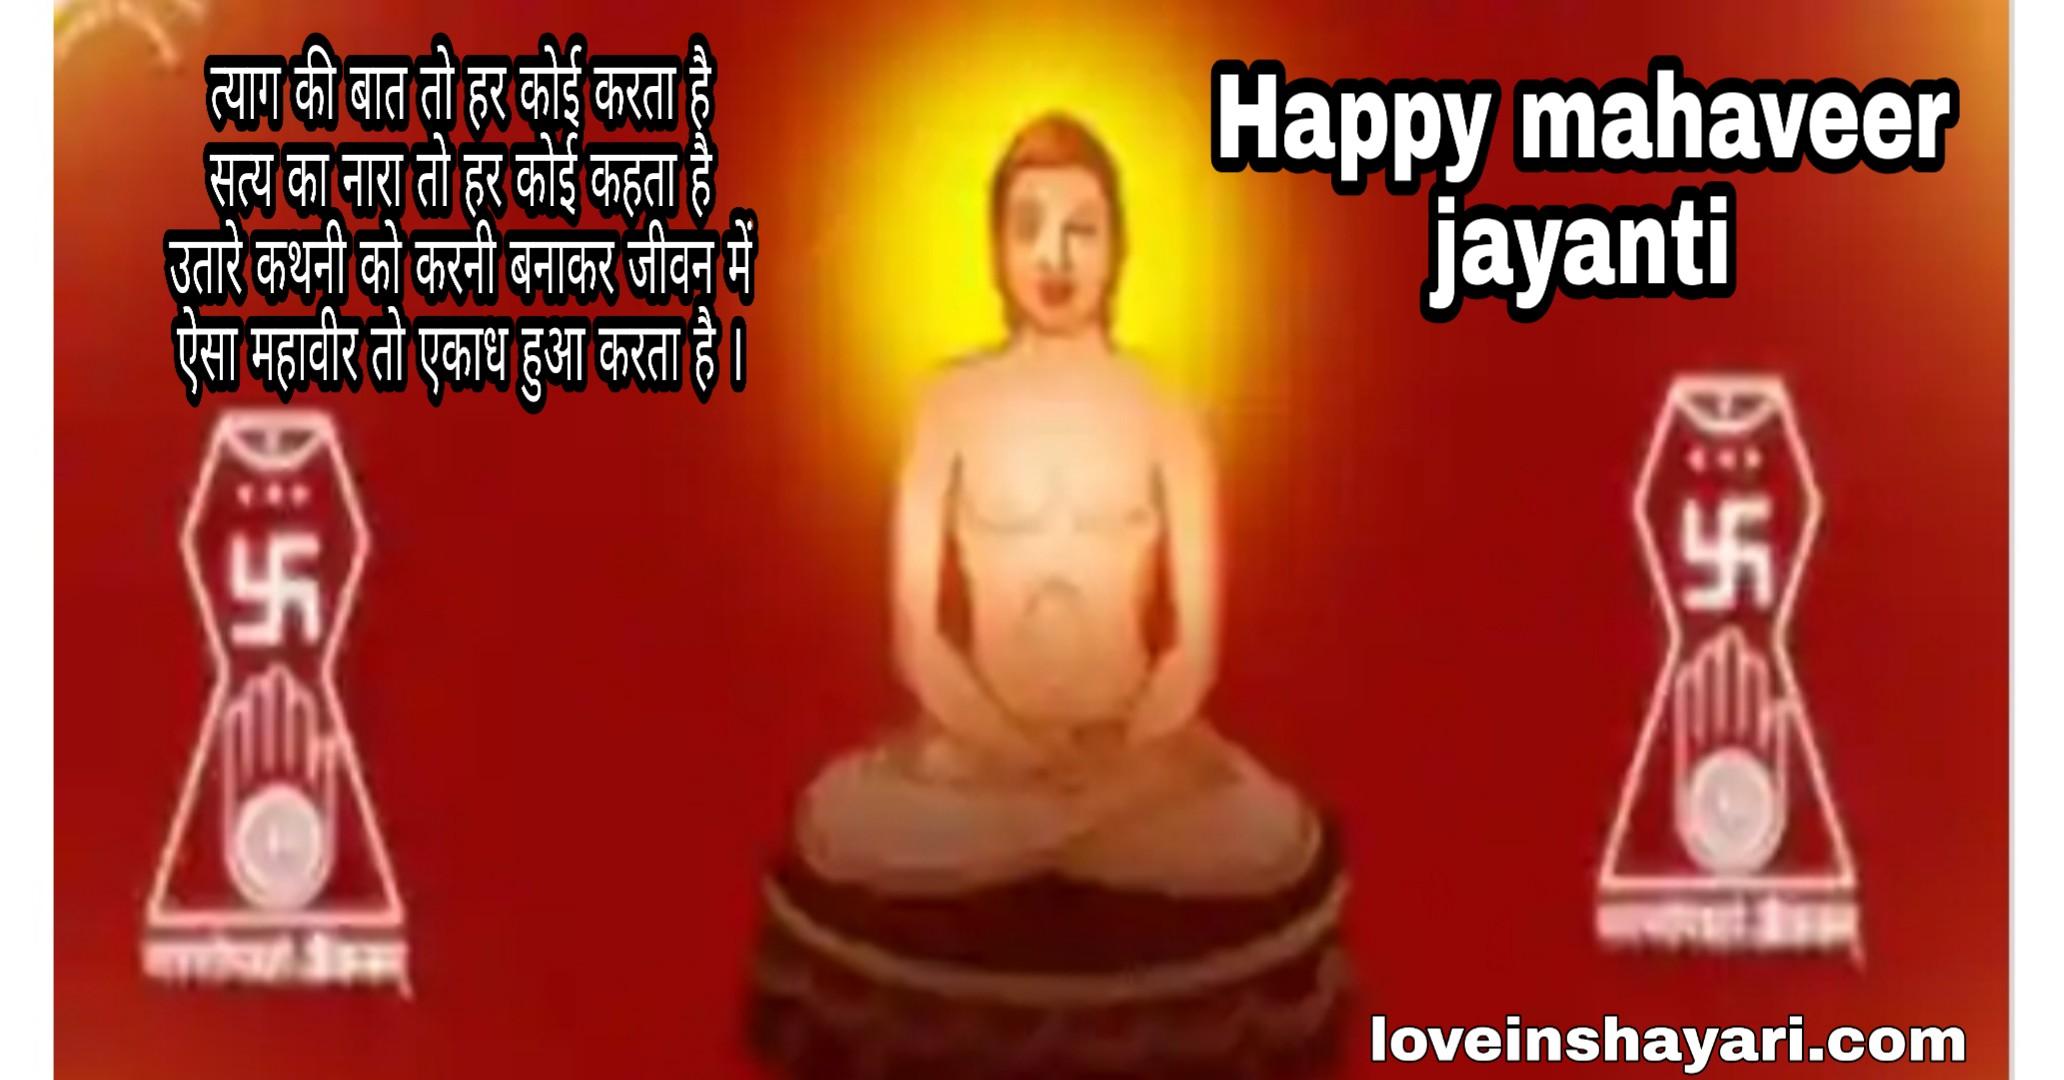 Mahaveer jayanti Images 2020